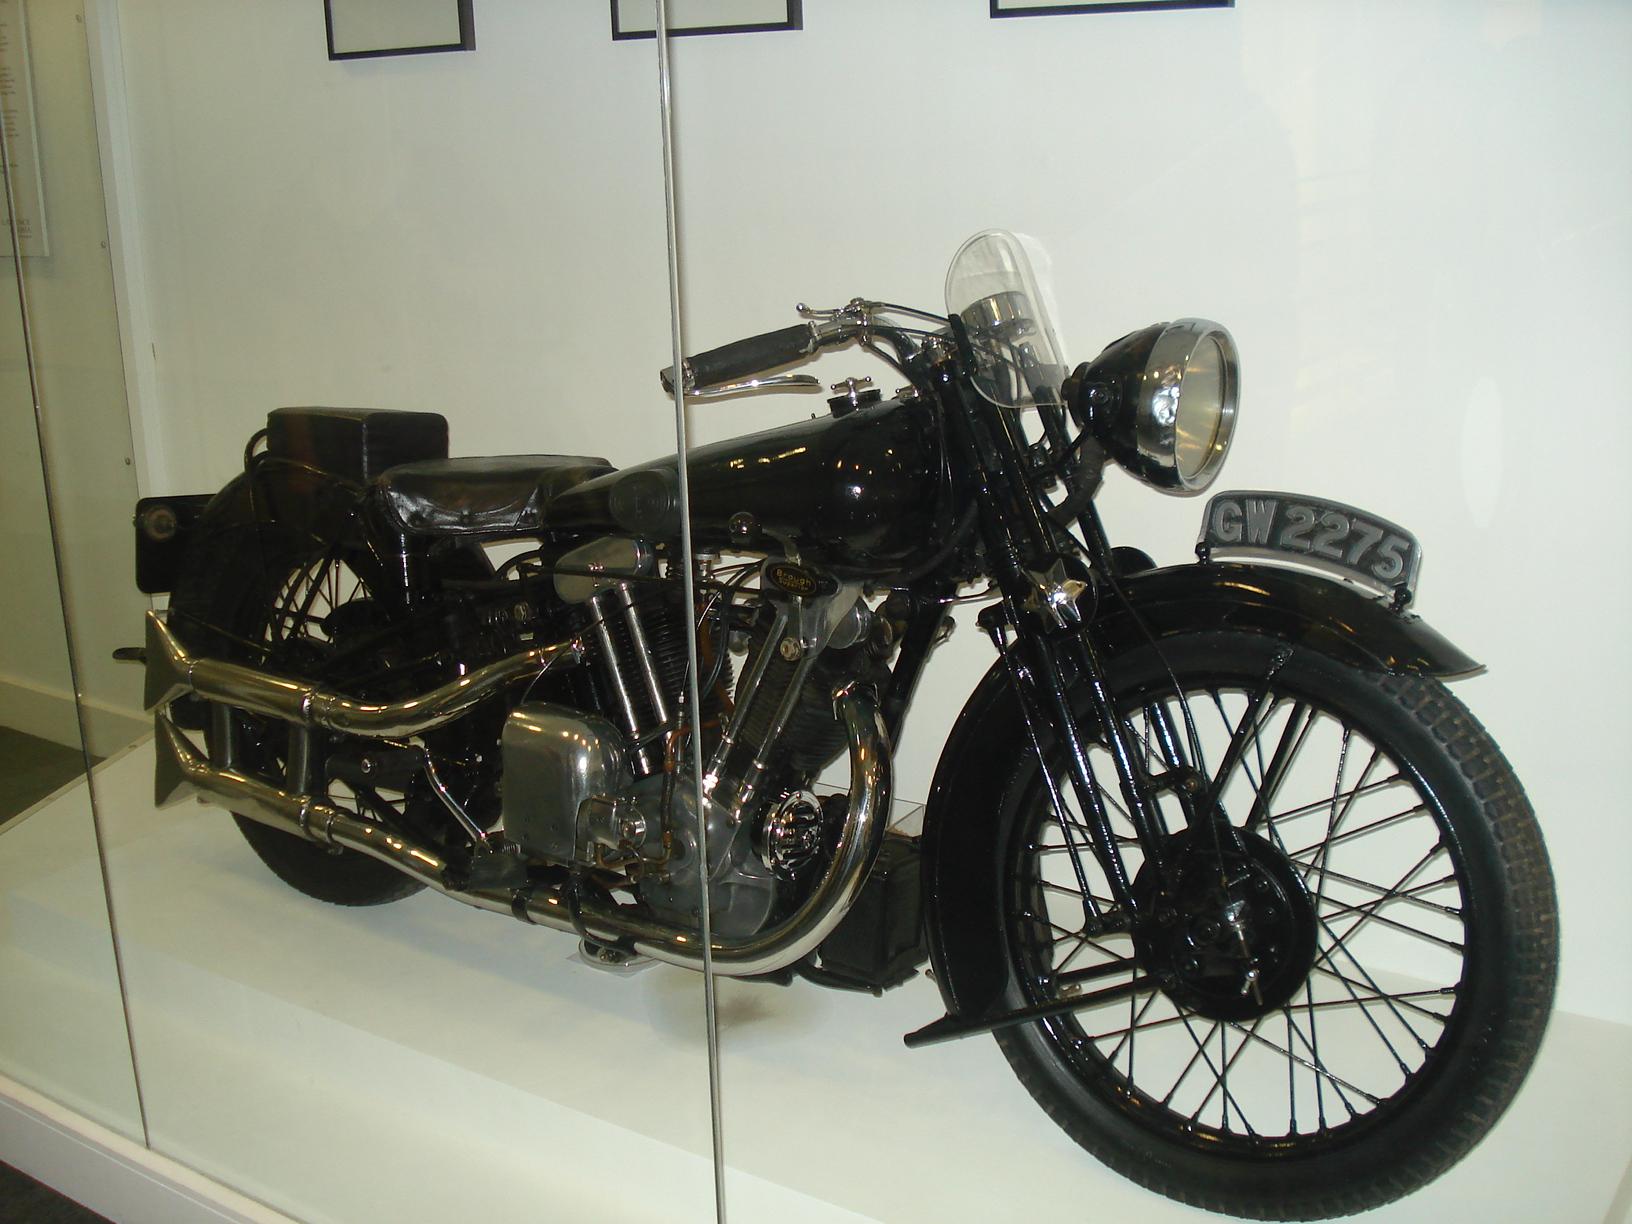 David 8 Lawrence Of Arabia Lawrence Arabia Brough Motorcycle